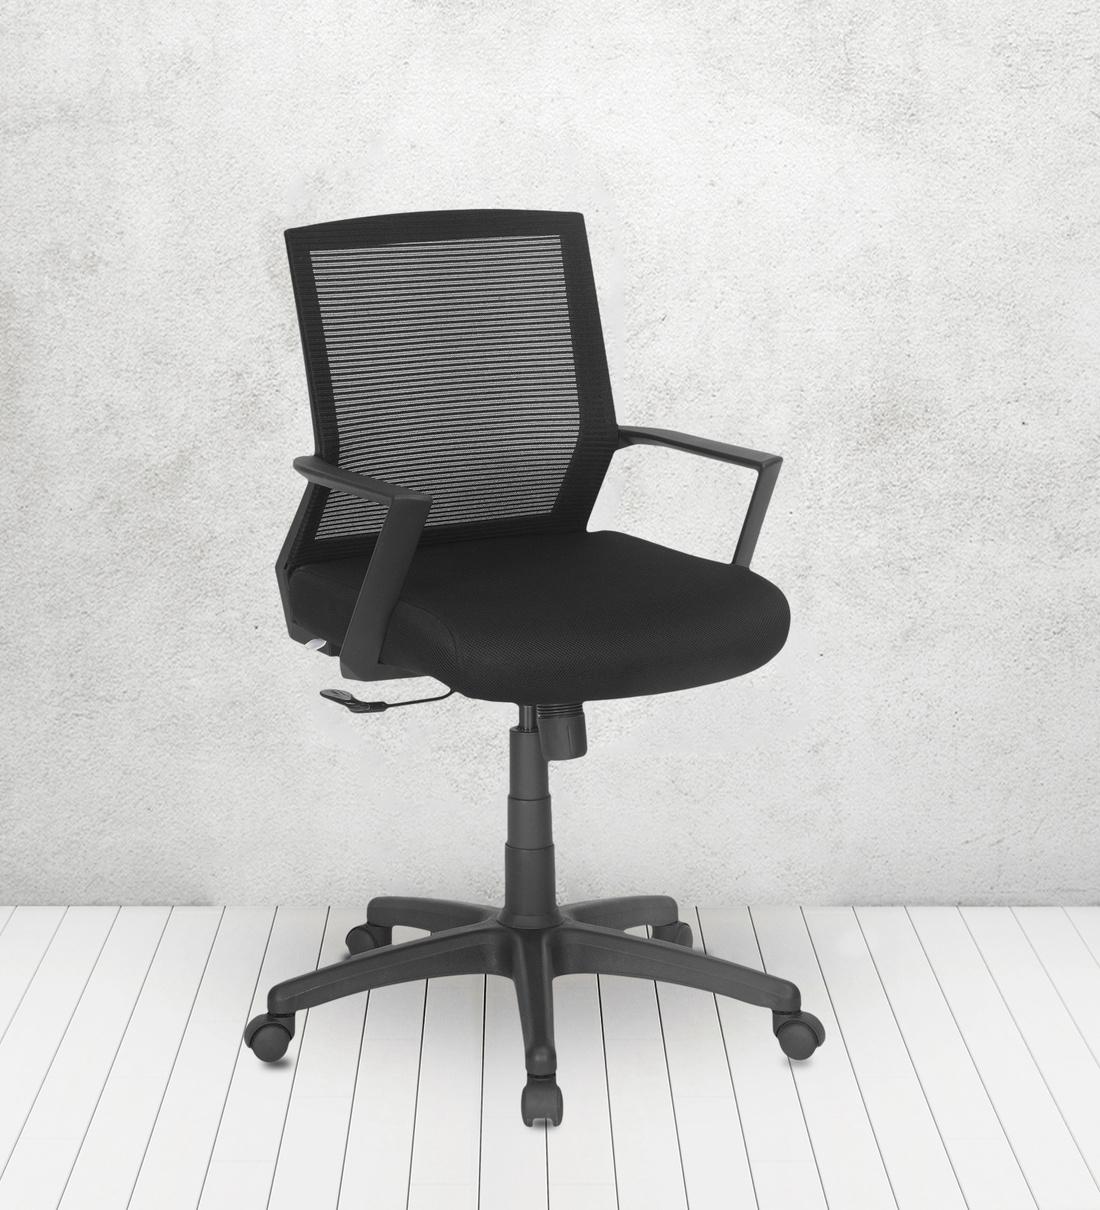 Buy Erika Mid Back Mesh Ergonomic Chair in Black Color by Nilkamal